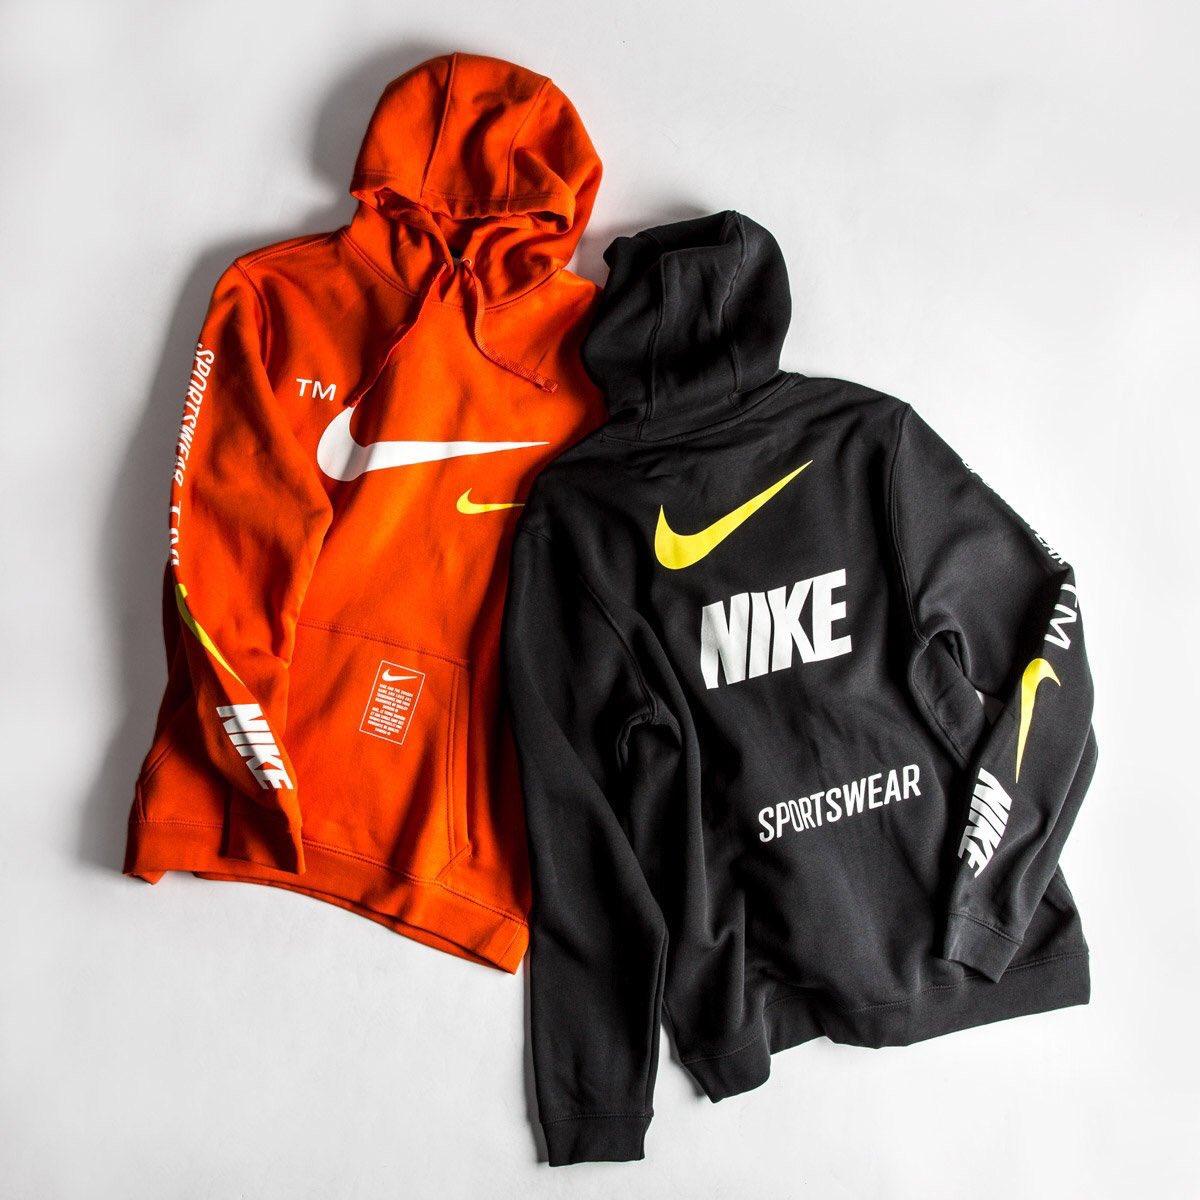 ... hoodies dropped today here  Finishline Men http   bit.ly 2A6x7vu  KicksUSA Men Black http   bit.ly 2IQFMEQ Men Orange http   bit.ly 2Cd6rdZ  Nike Kids ... 39a16c4b9e3f